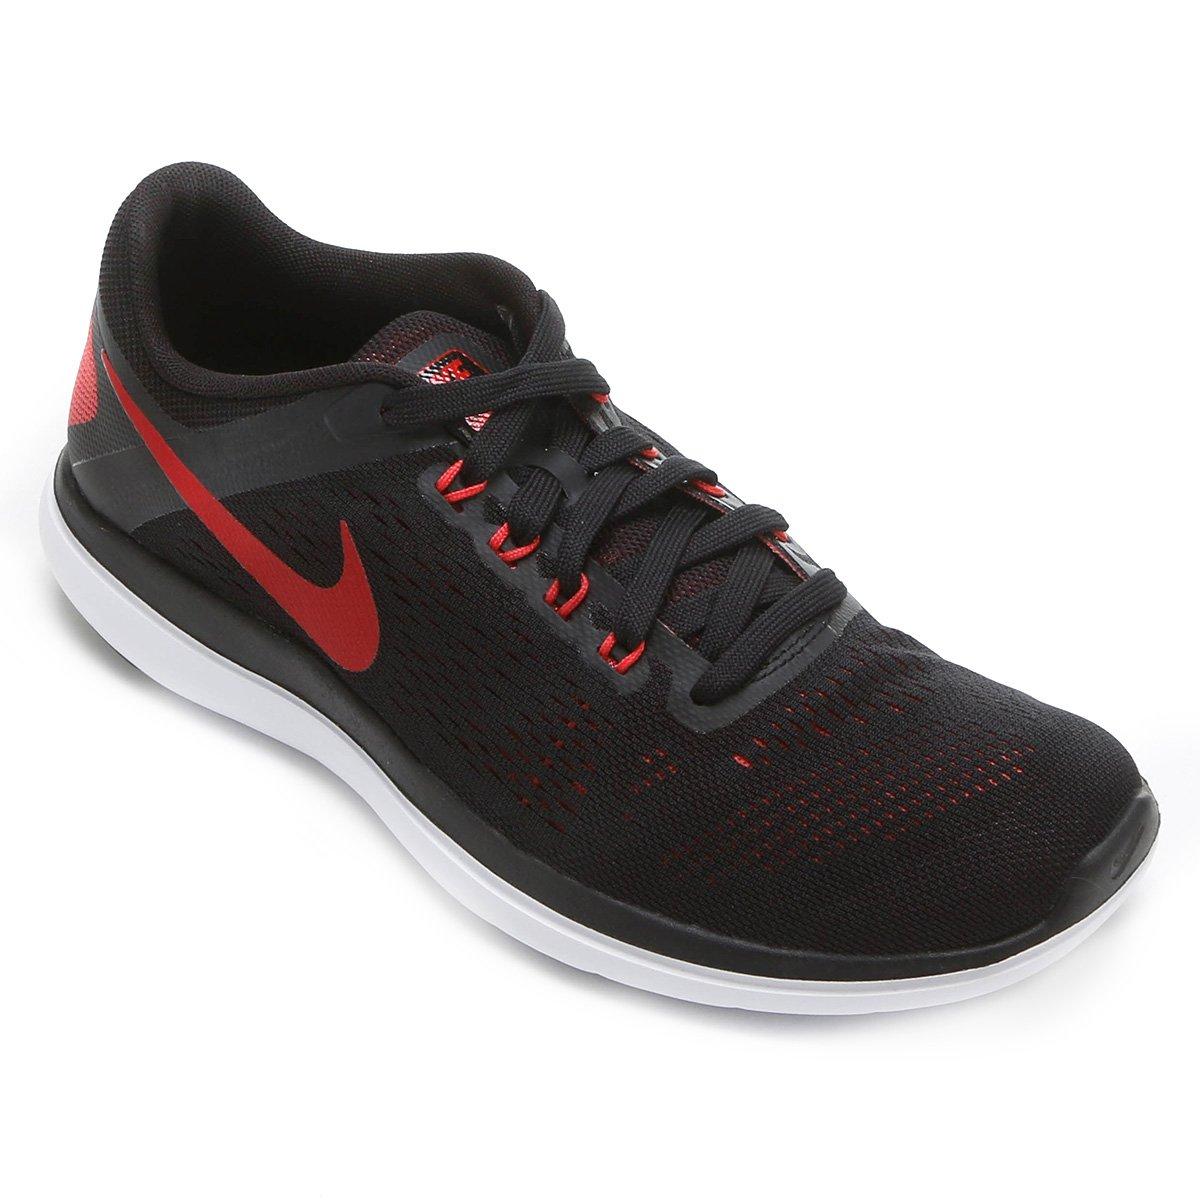 0fe1bf88b7 Tênis Nike Flex 2016 RN Masculino - Preto+Vermelho